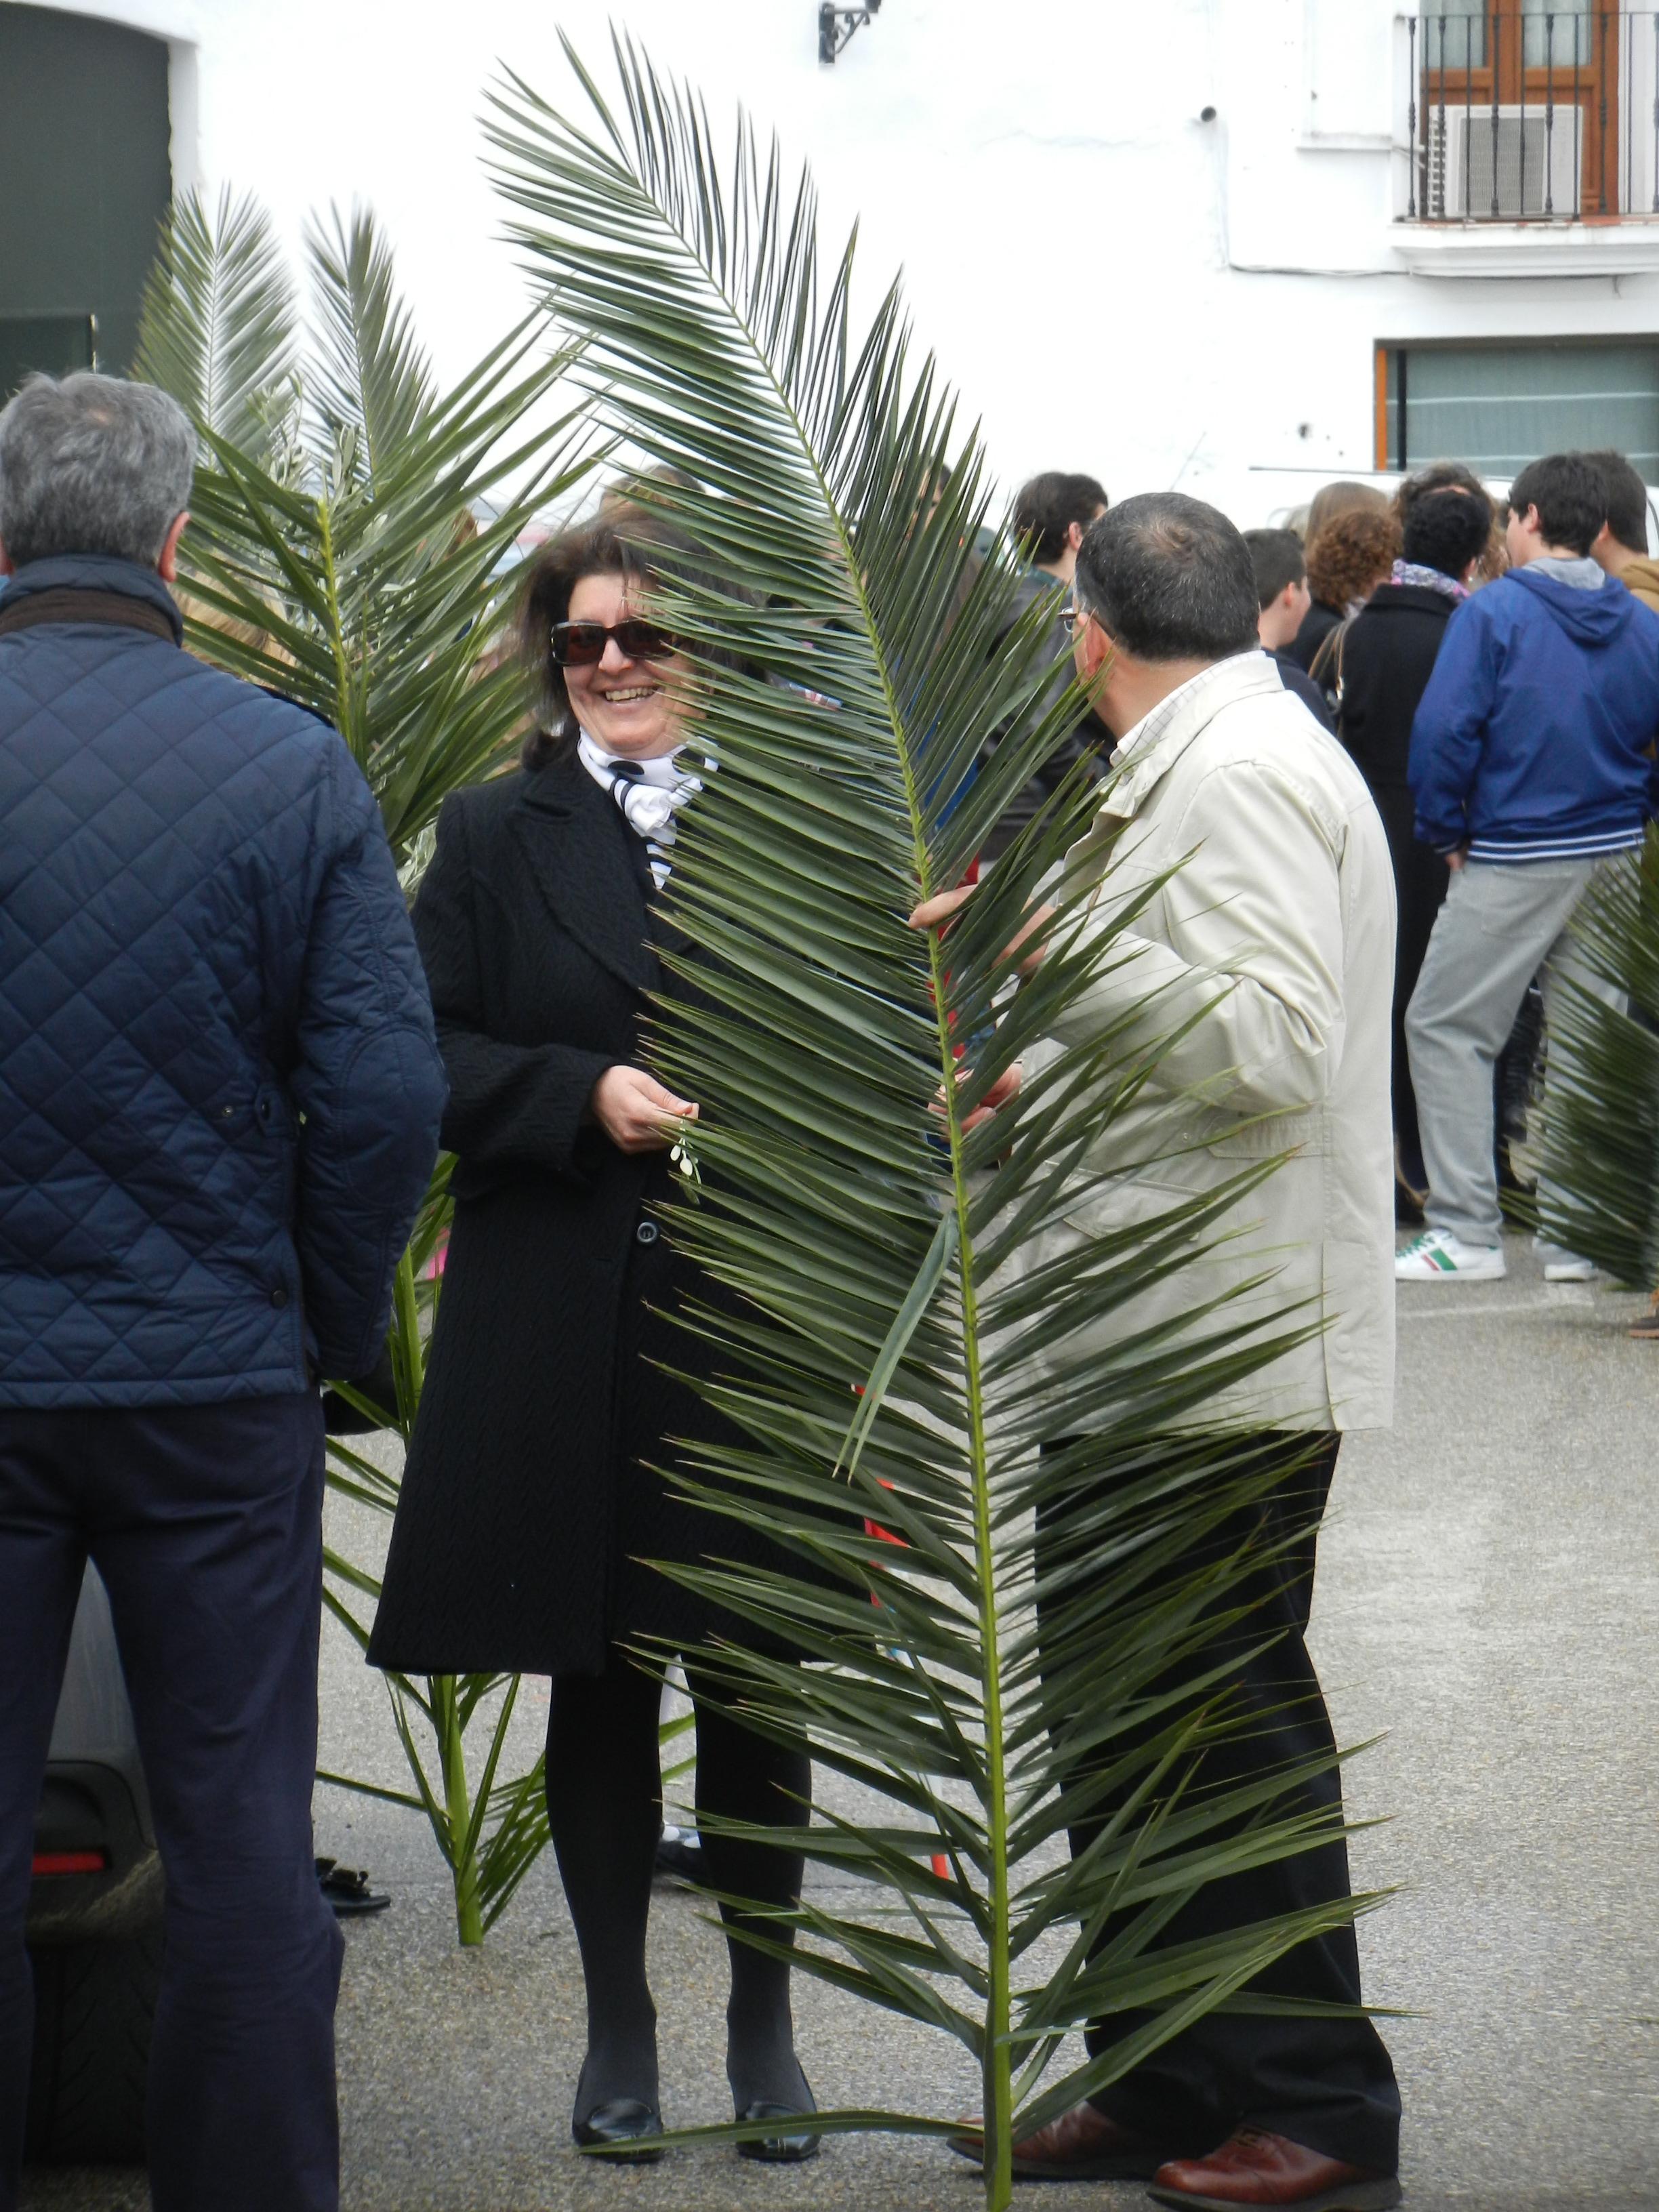 Los fieles esperan la salida de la Borriquita